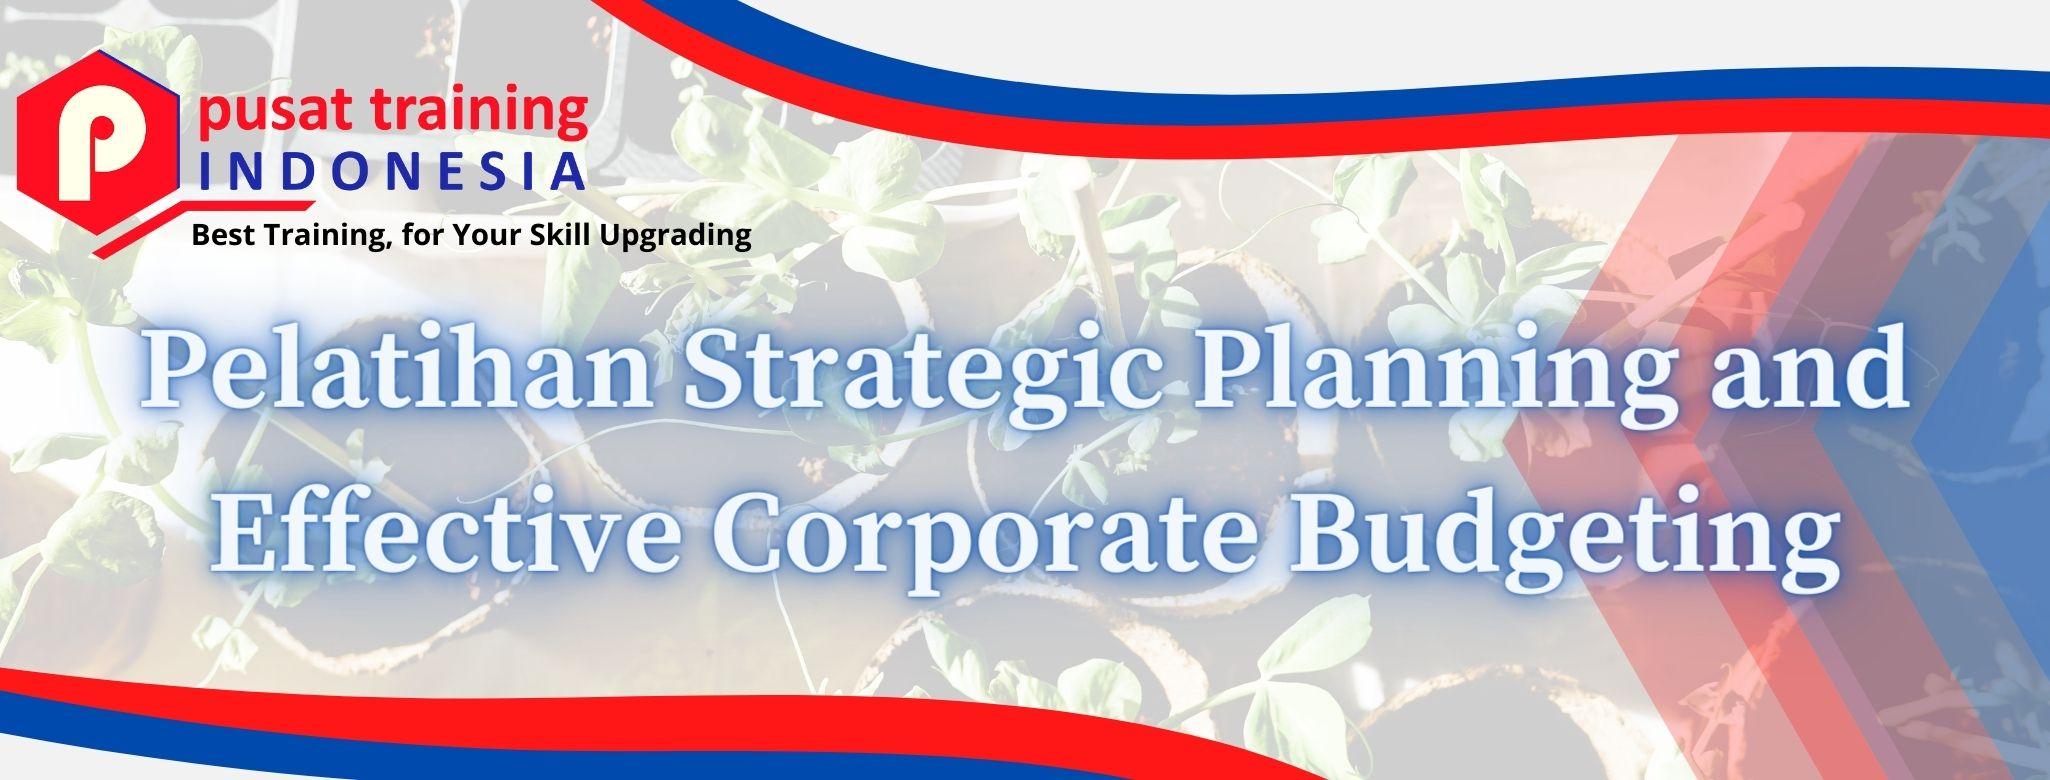 Pelatihan-Strategic-Planning-and-Effective-Corporate-Budgeting